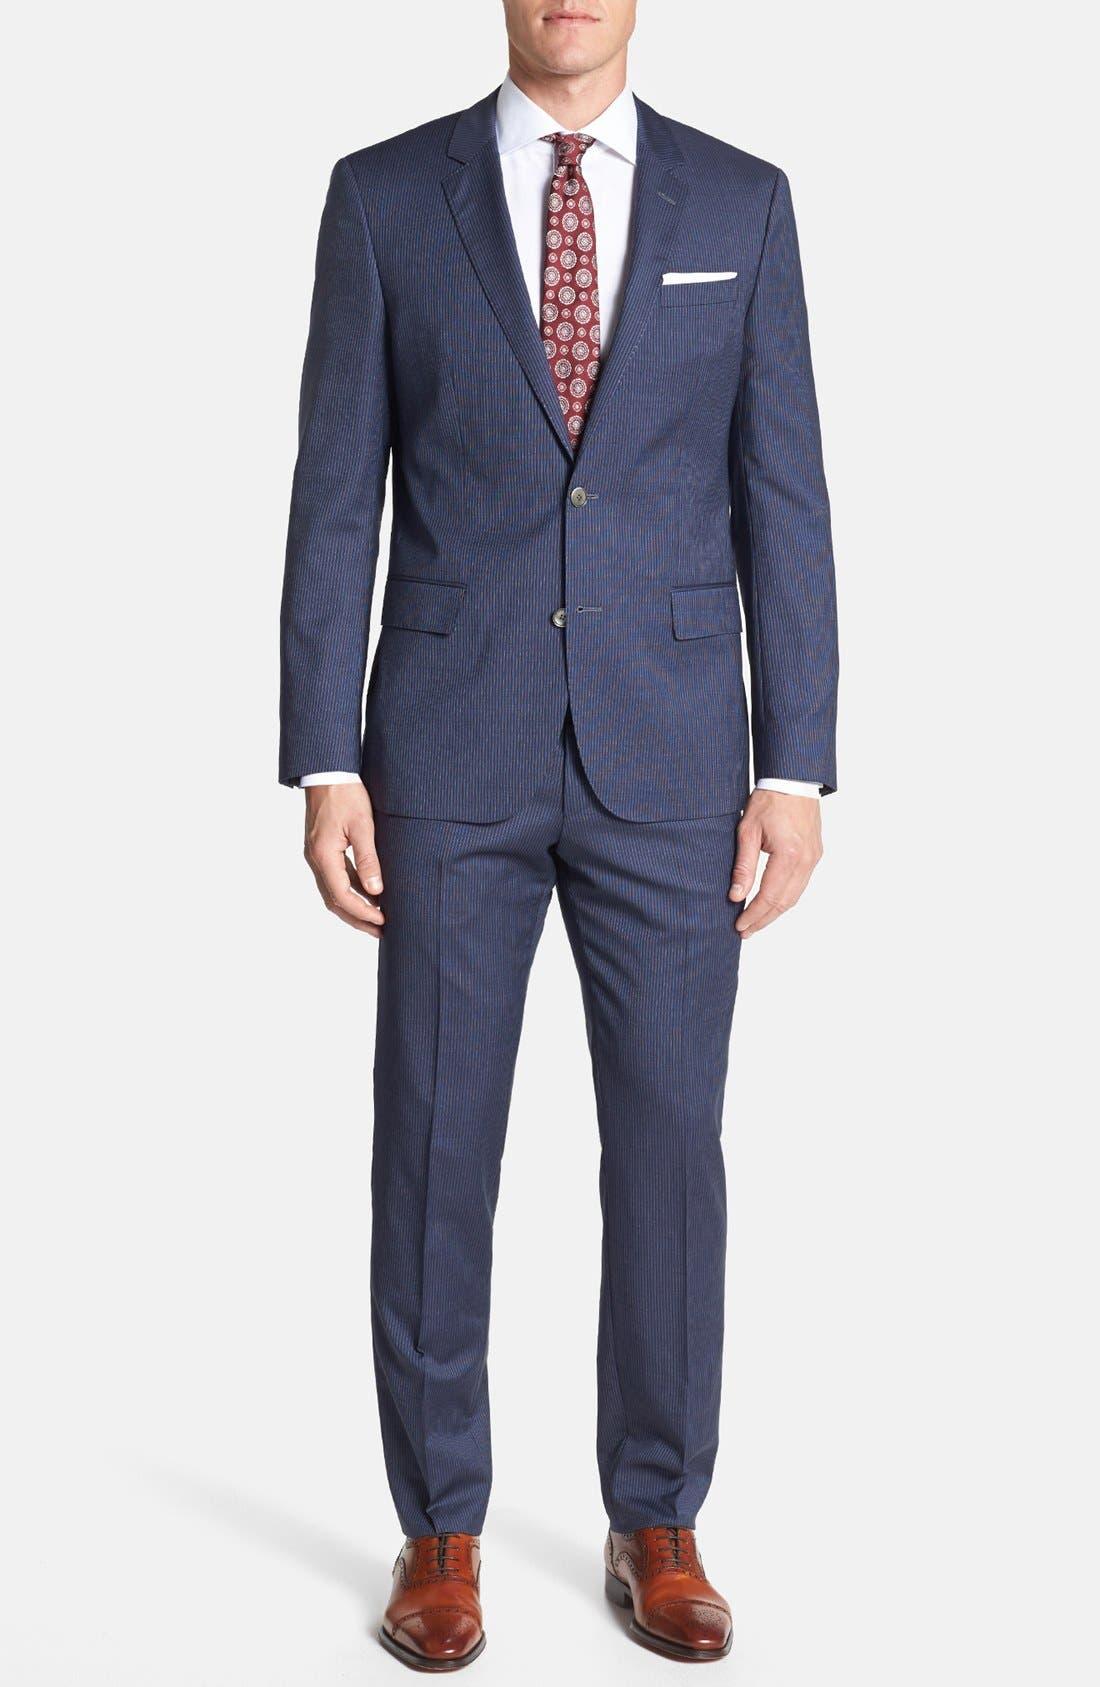 Main Image - BOSS HUGO BOSS 'Hutson/Gander' Trim Fit Stripe Suit